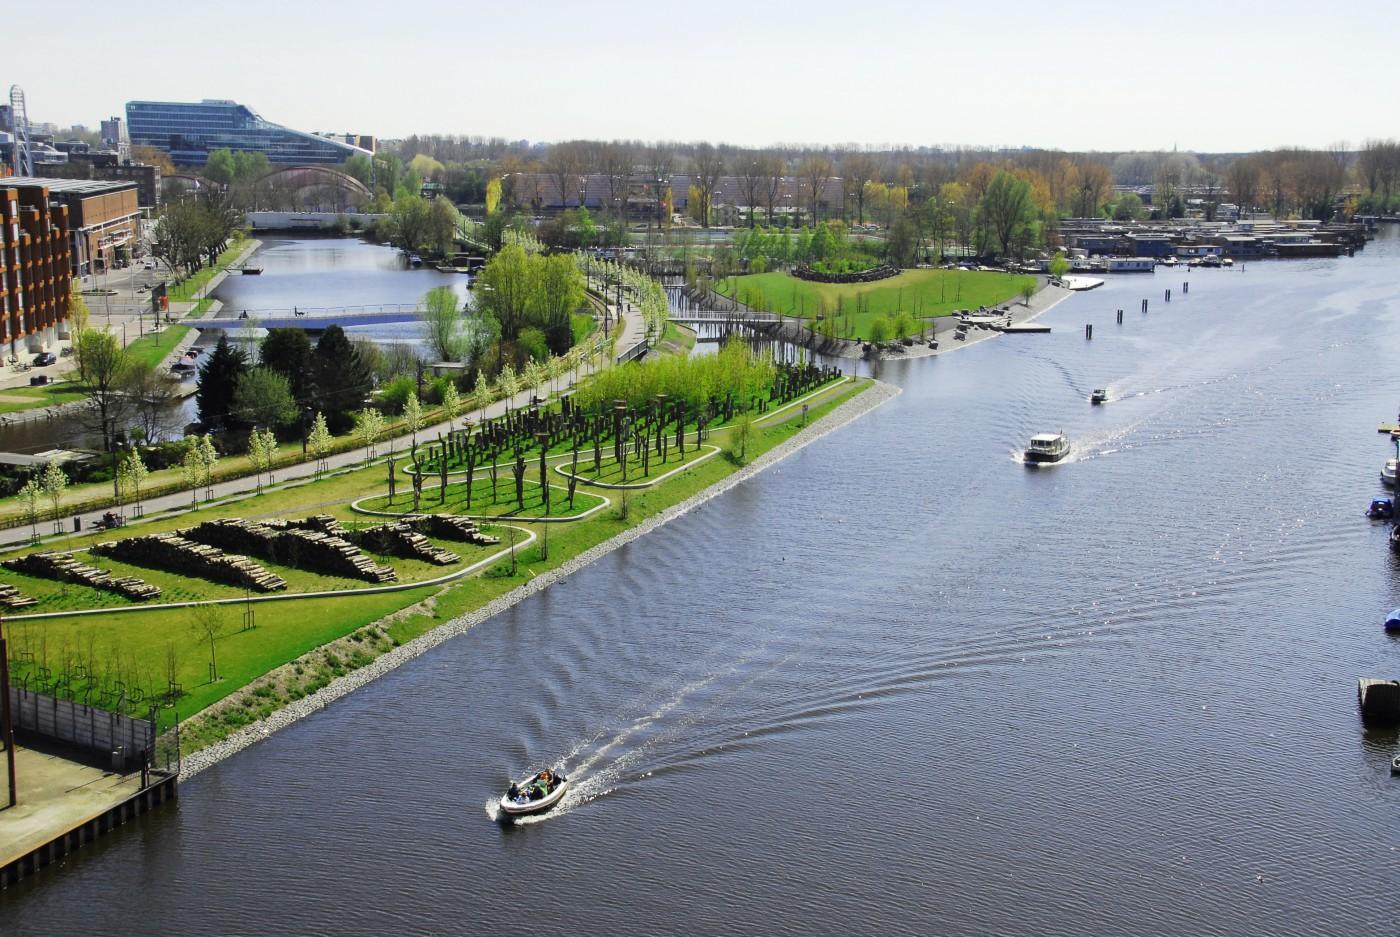 buro-sant-en-co-landschapsarchitectuur-park-schinkeleilanden-amsterdam-stadspark-stadsnatuur-ecologie-waterfront